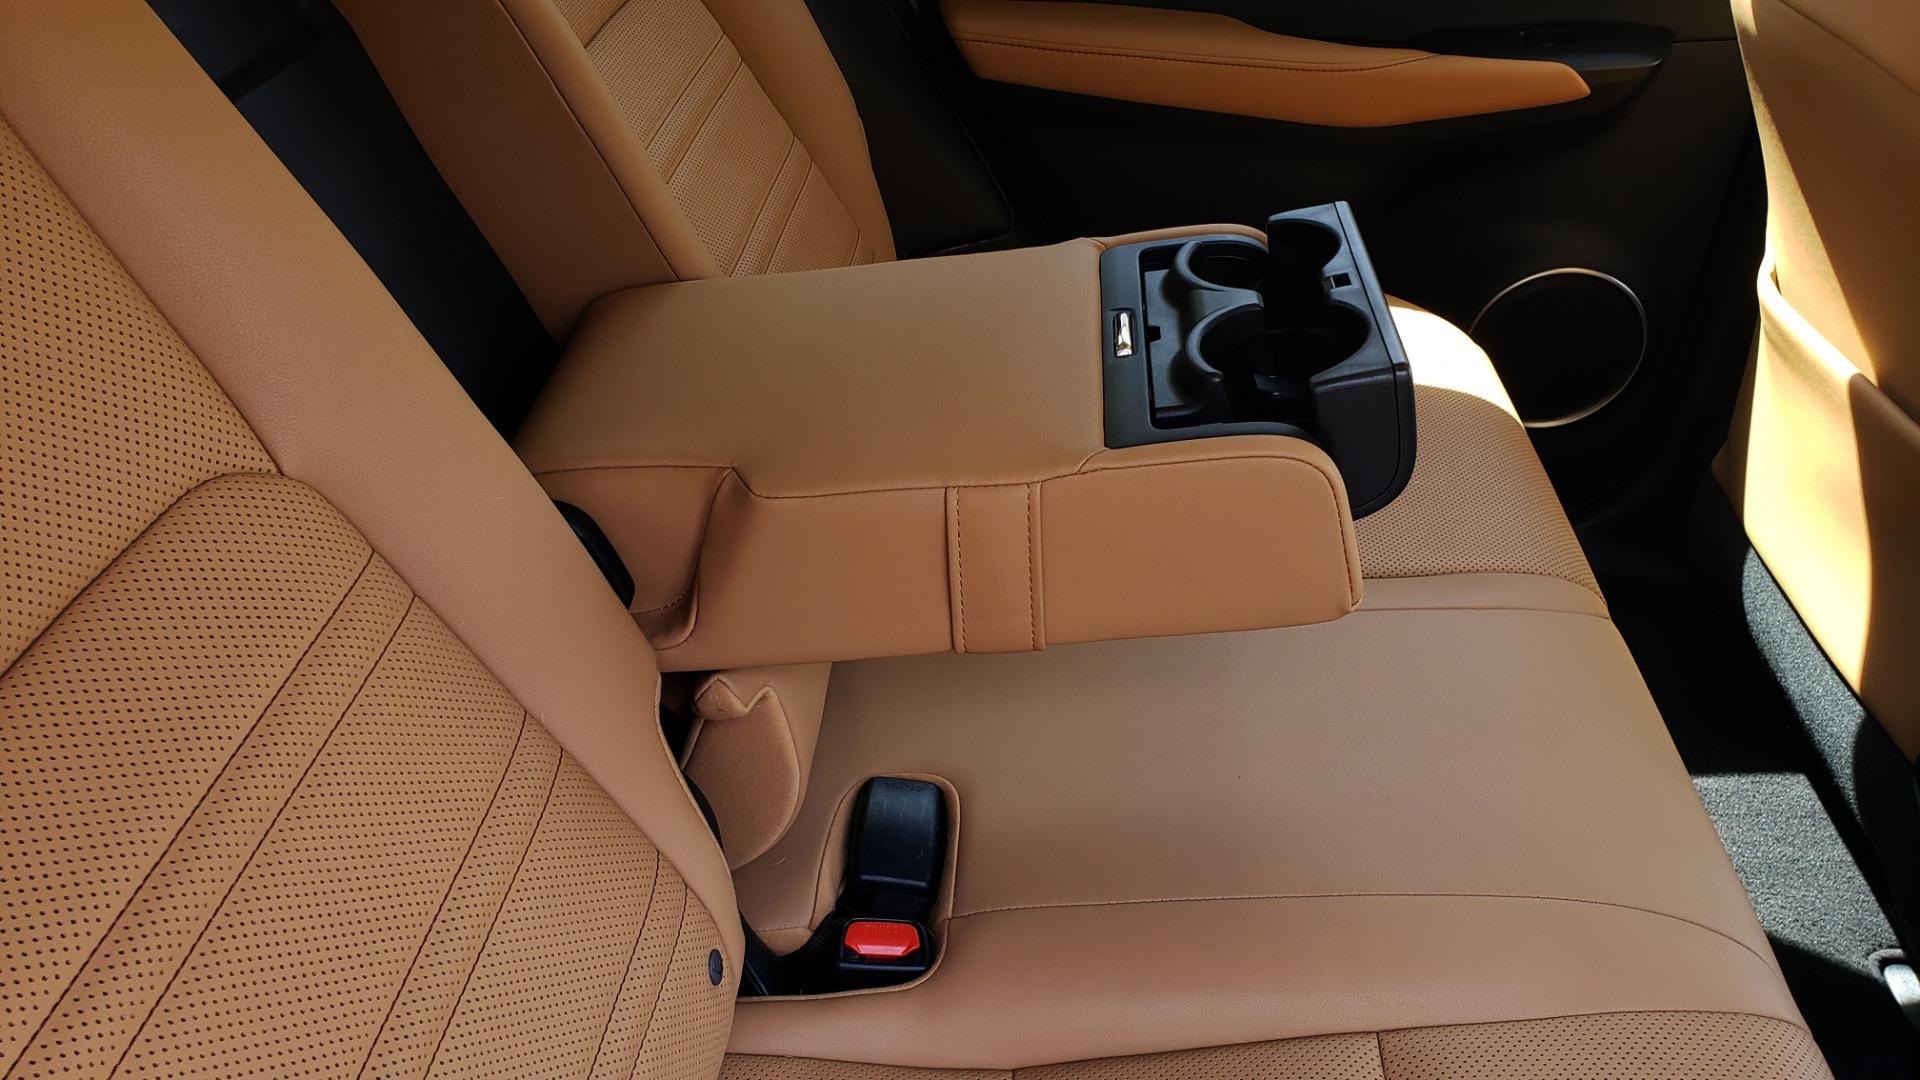 Used 2016 Lexus NX 200T PREM PKG / NAV / SUNROOF / PRE-COLLISION / PARK ASST for sale Sold at Formula Imports in Charlotte NC 28227 72